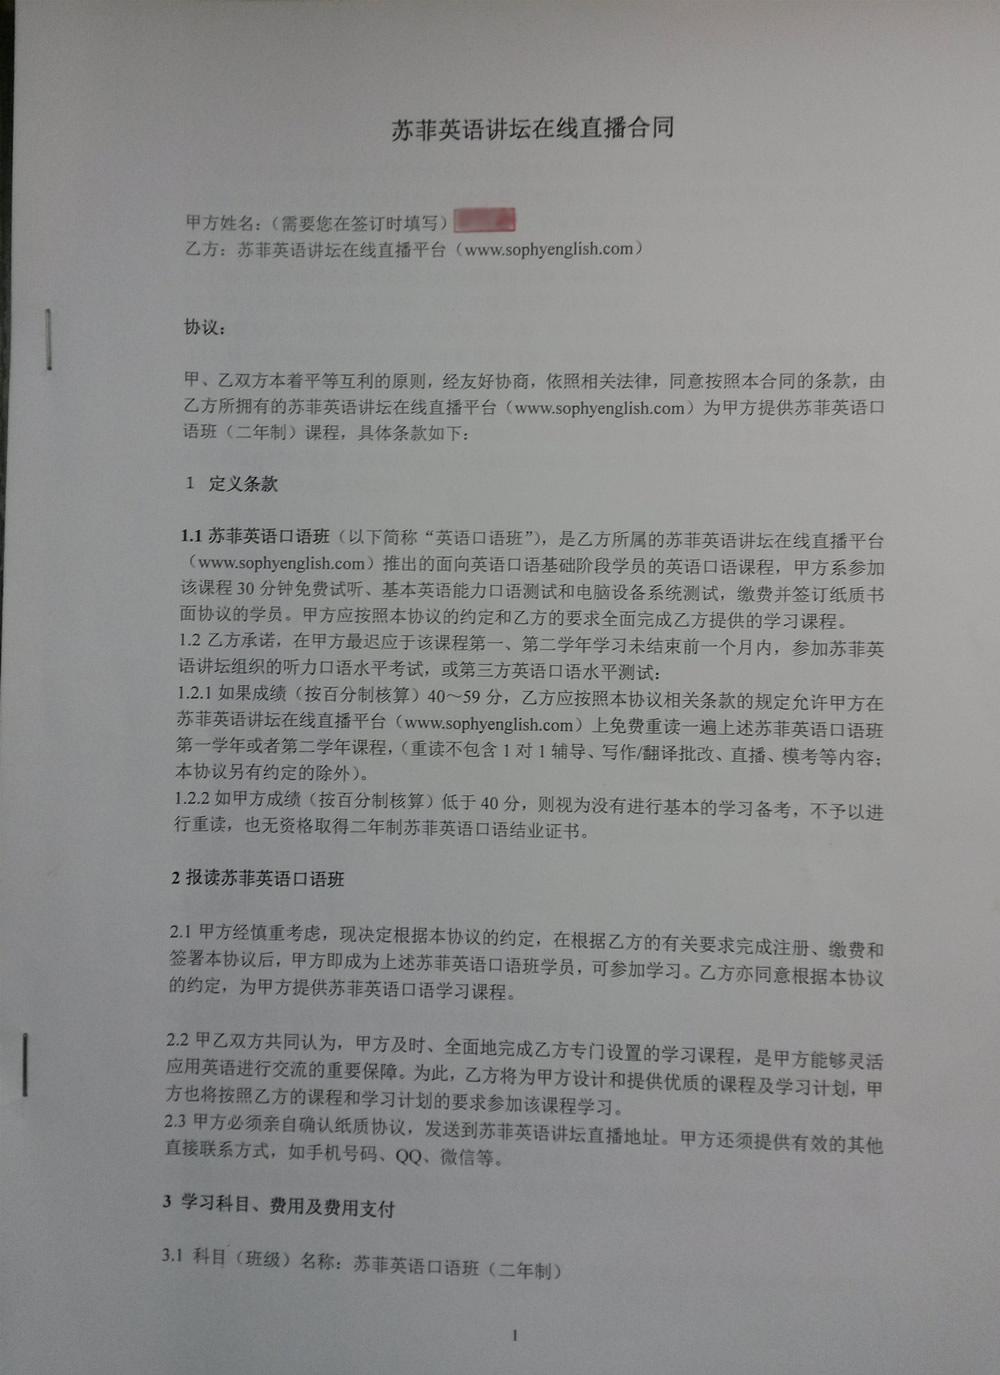 hetong 苏菲英语讲坛录取通知书暨入学合同样本